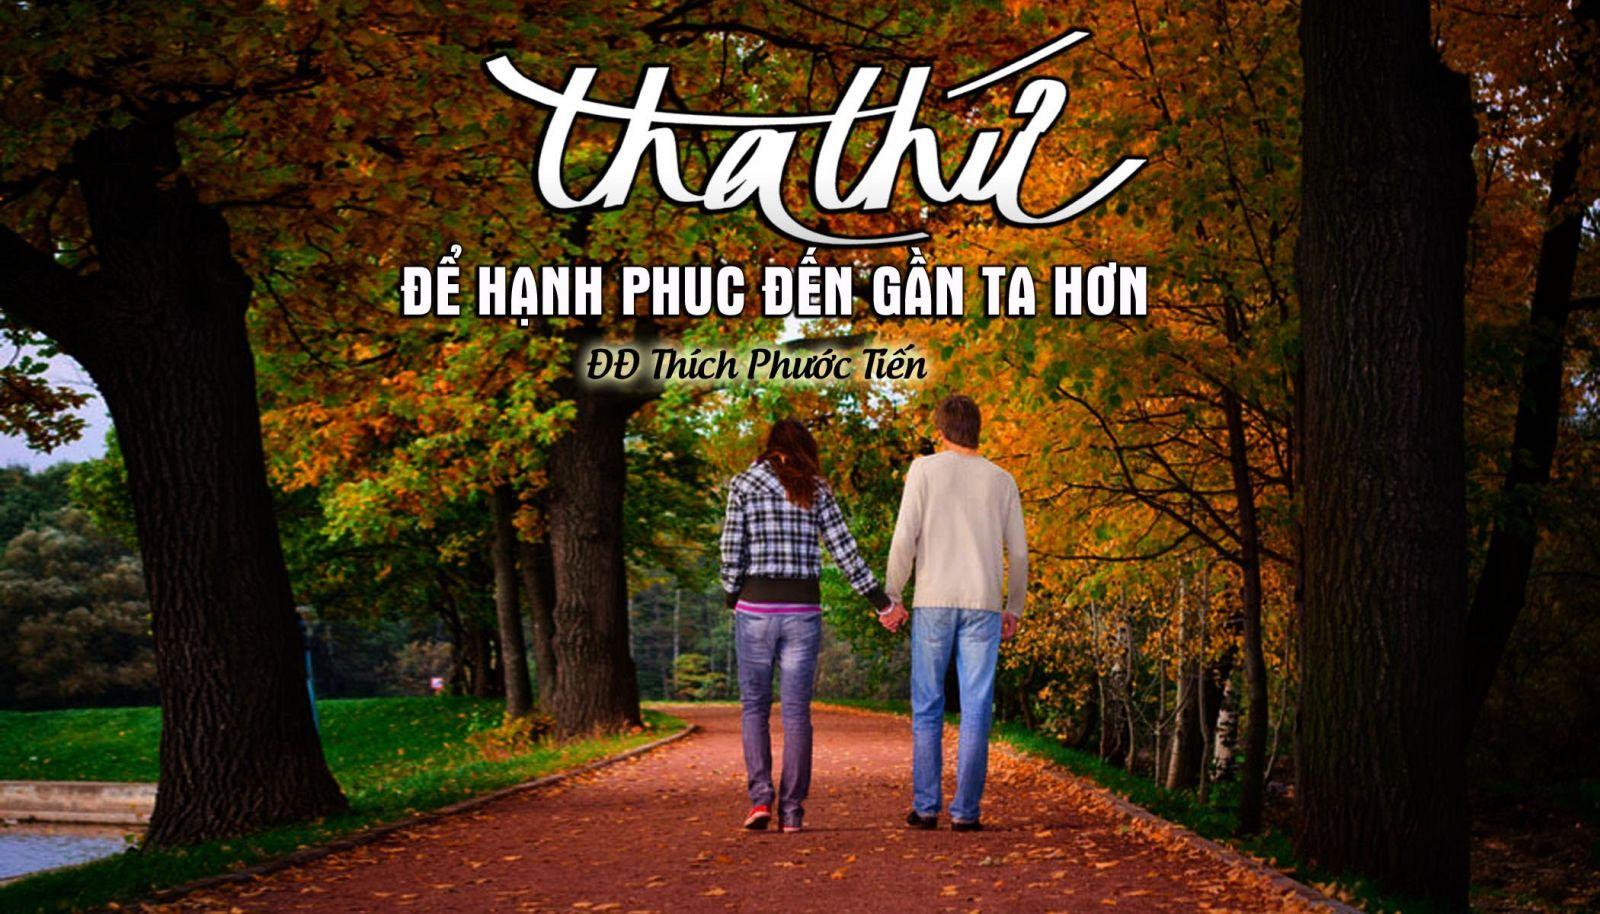 nhat-dinh-phai-tha-thu-cho-6-nguoi-nay-de-an-yen-den-het-doi2%20phunutoday_vn